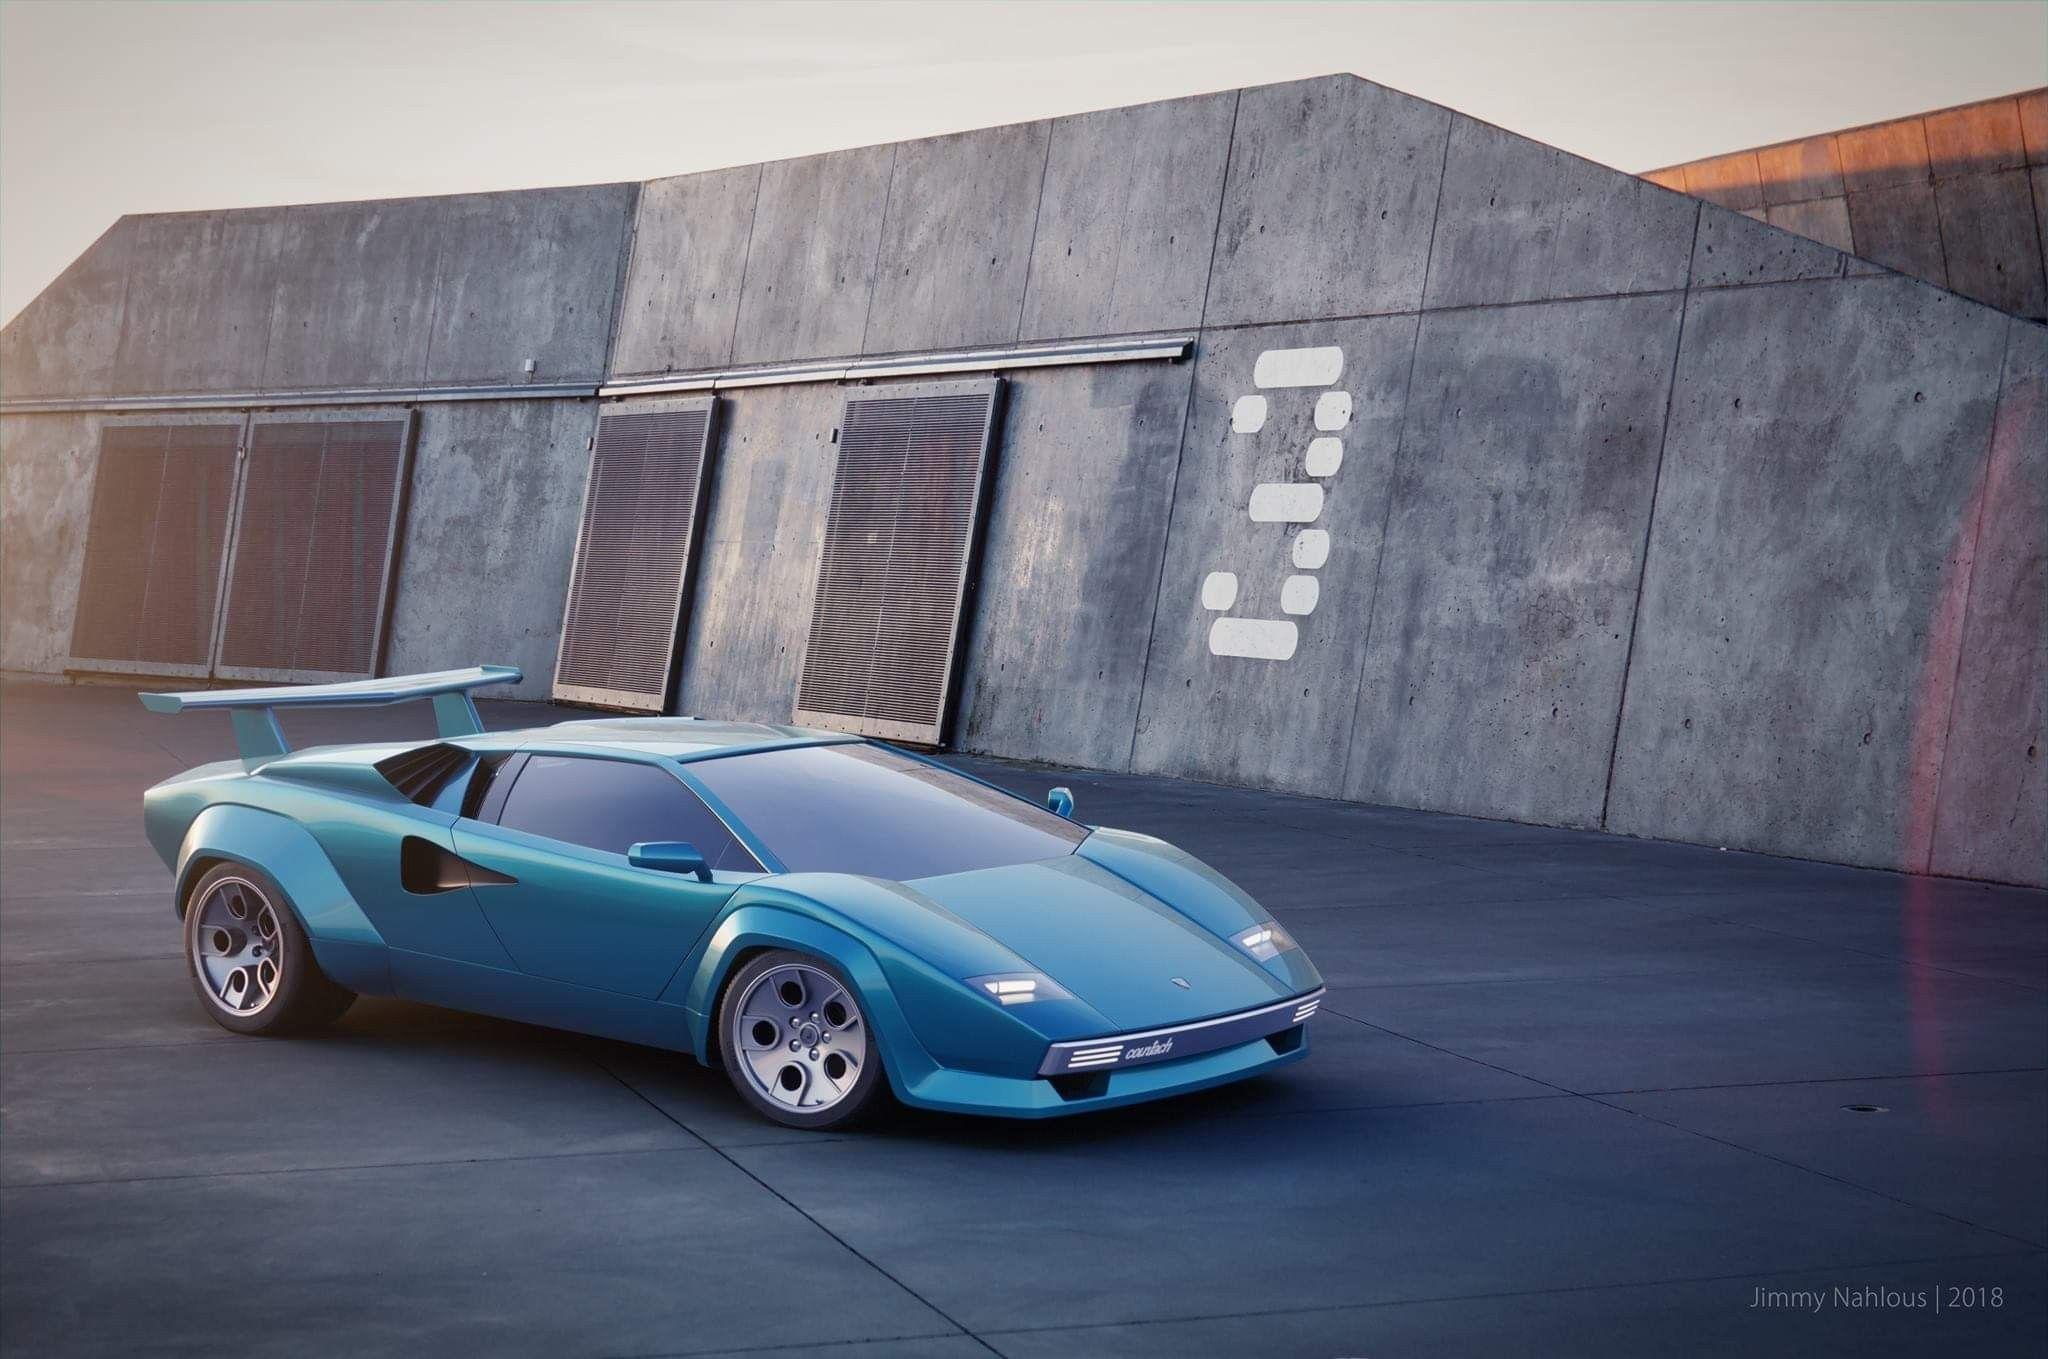 Pin by mike mckinney on Lamborghini Countach